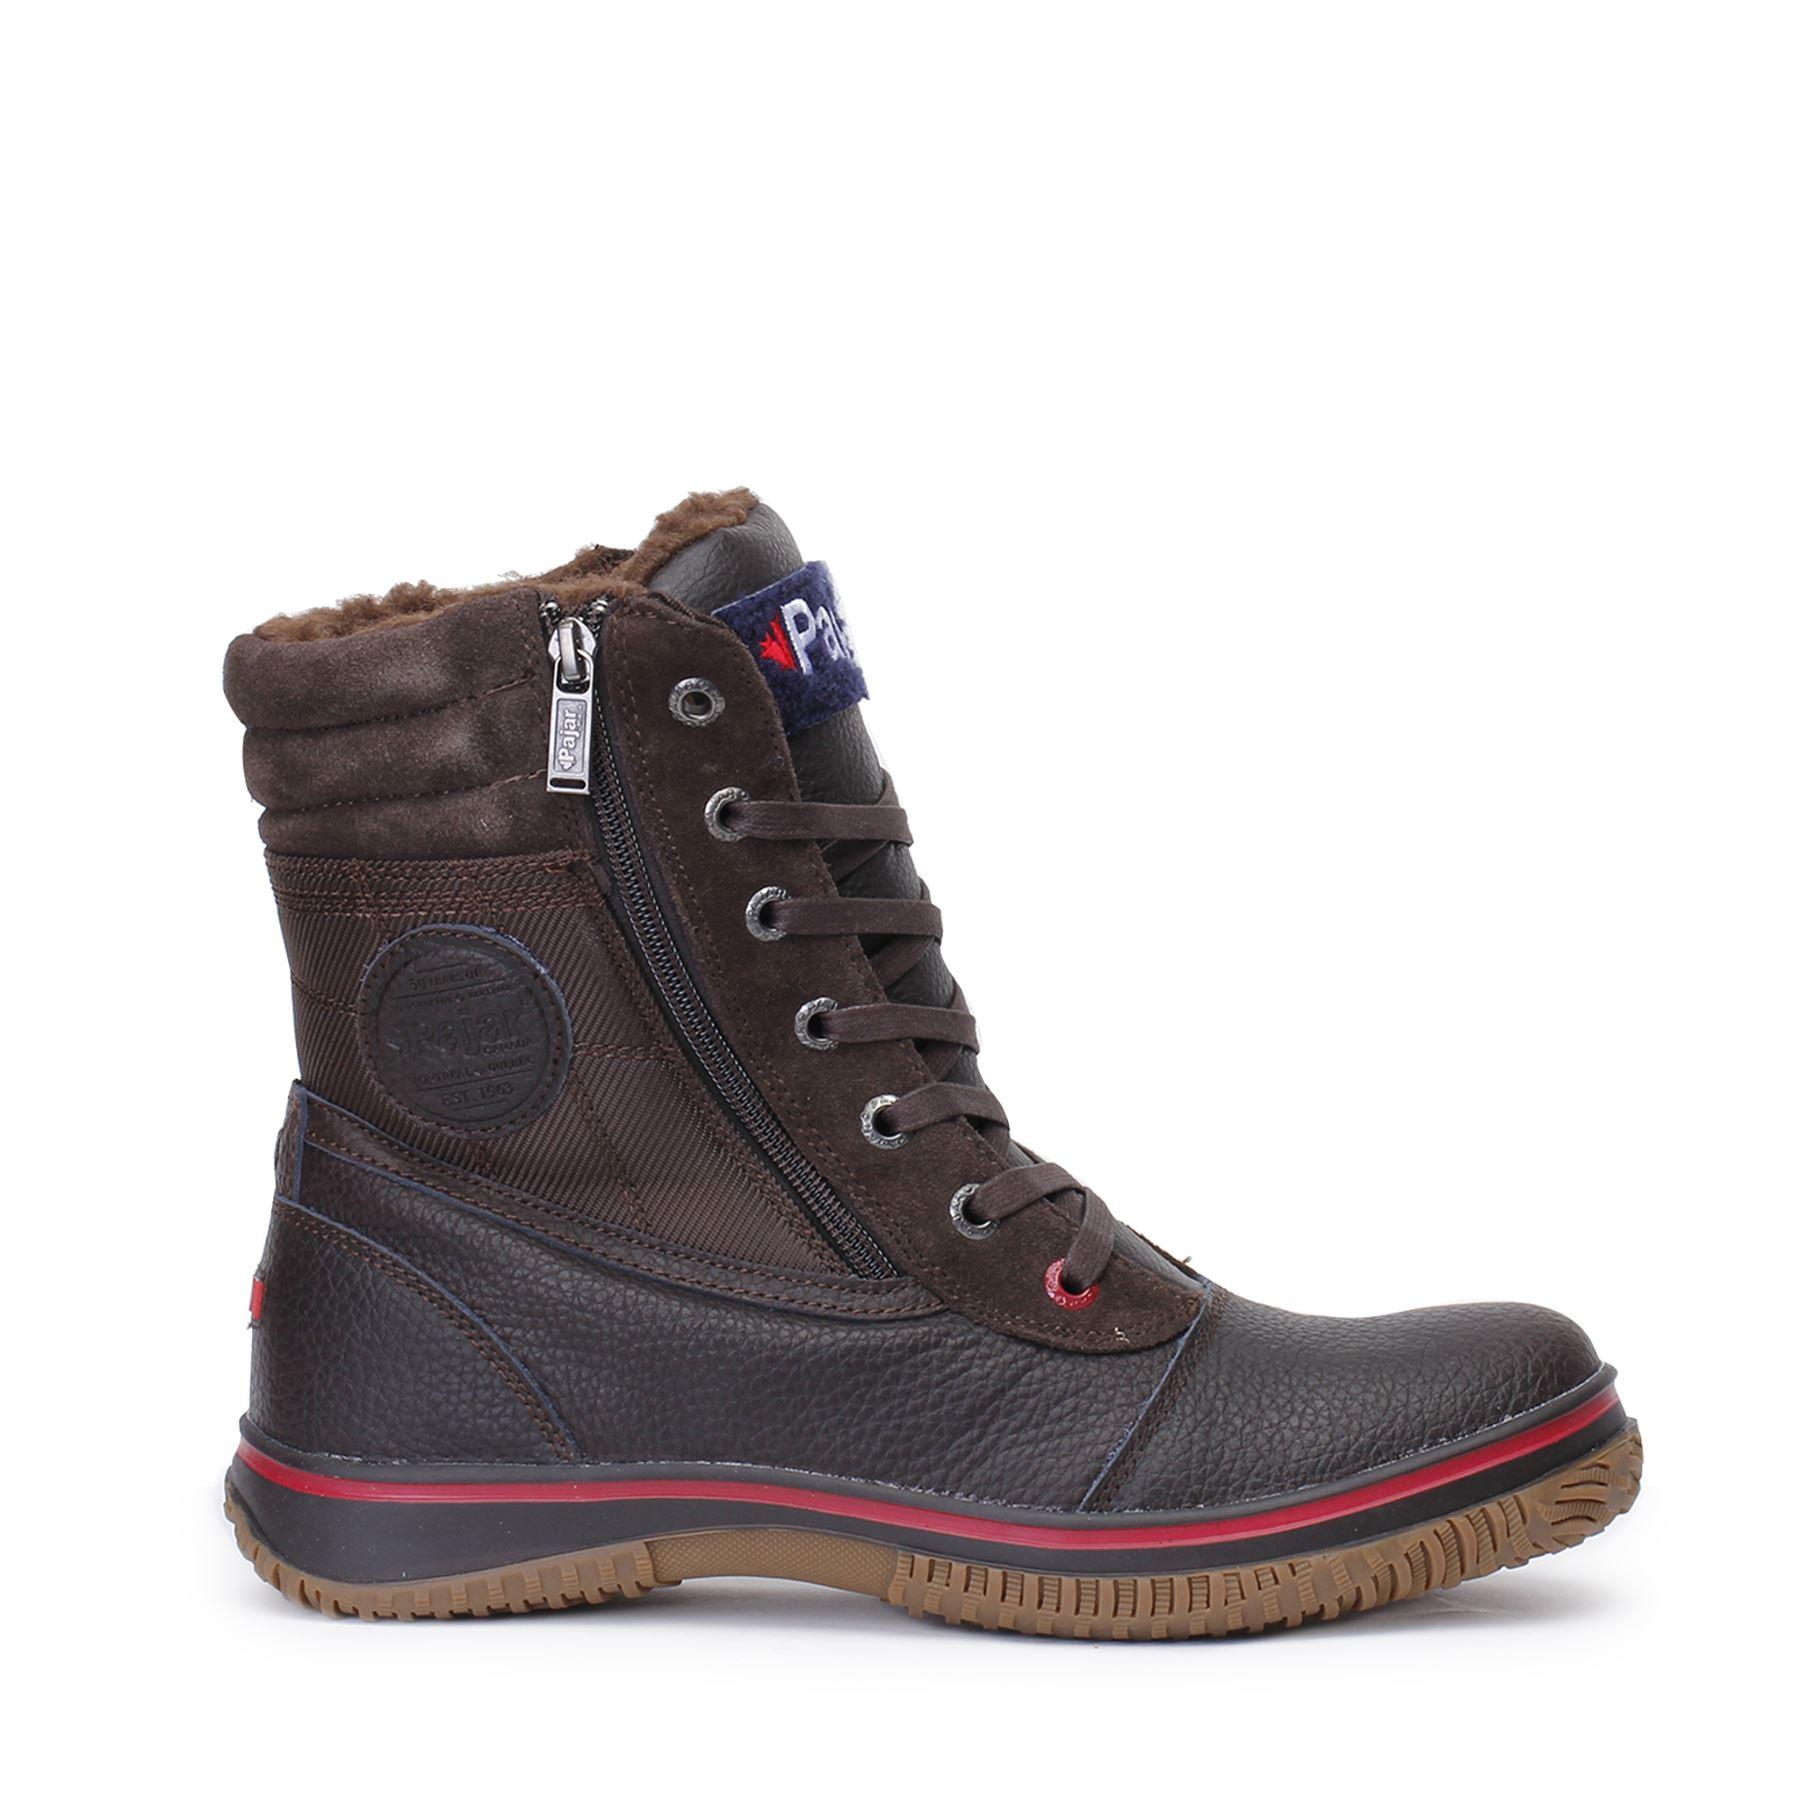 pajar canada mens trooper snow boots waterproof brown leather